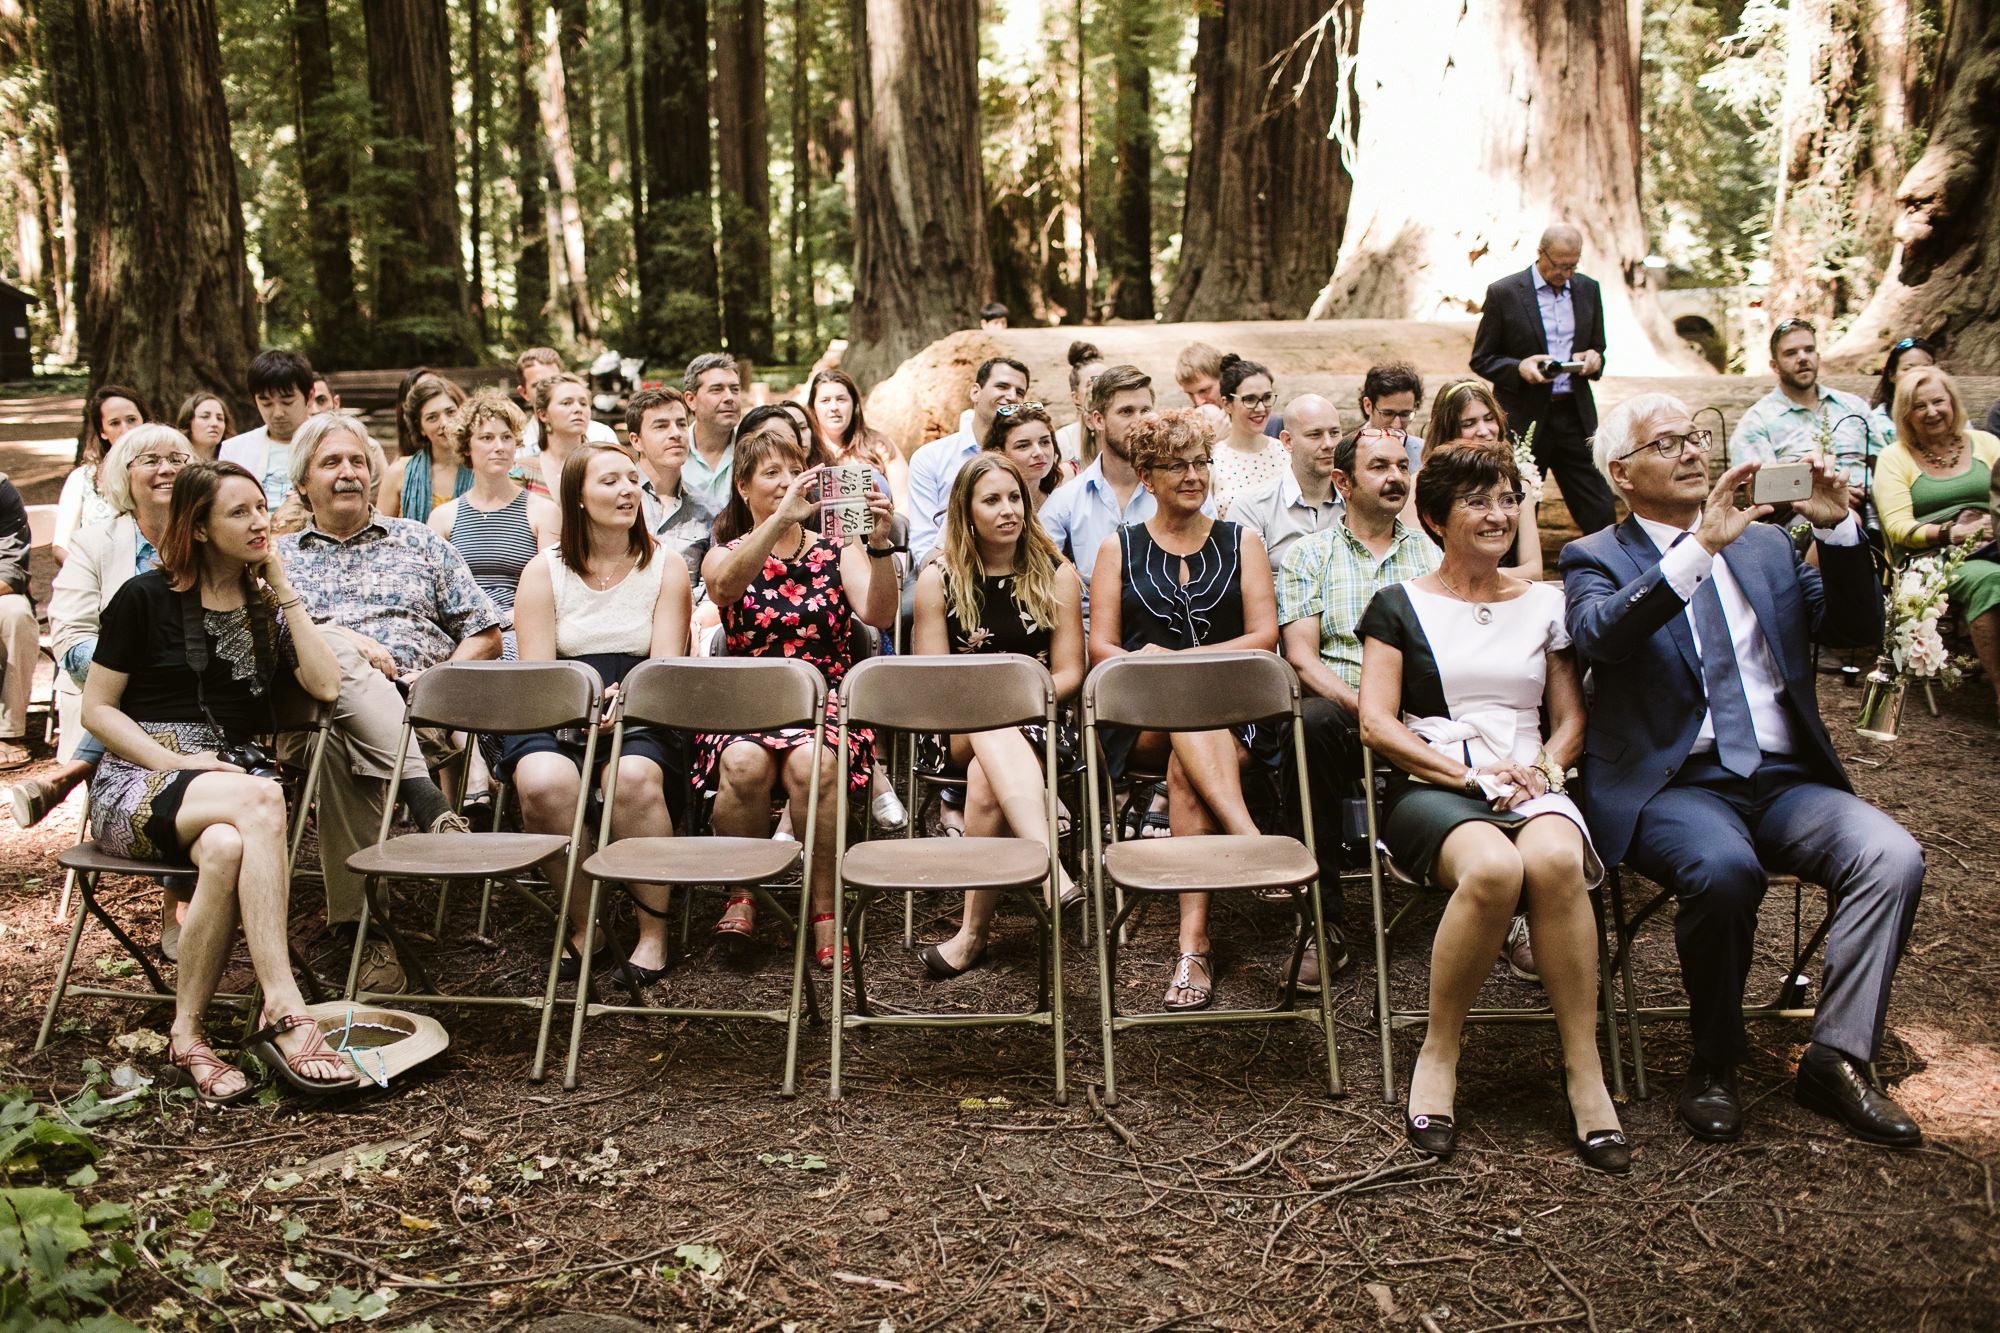 California-wedding-photographer-alfonso-flores-pamplin-groove-178.jpg